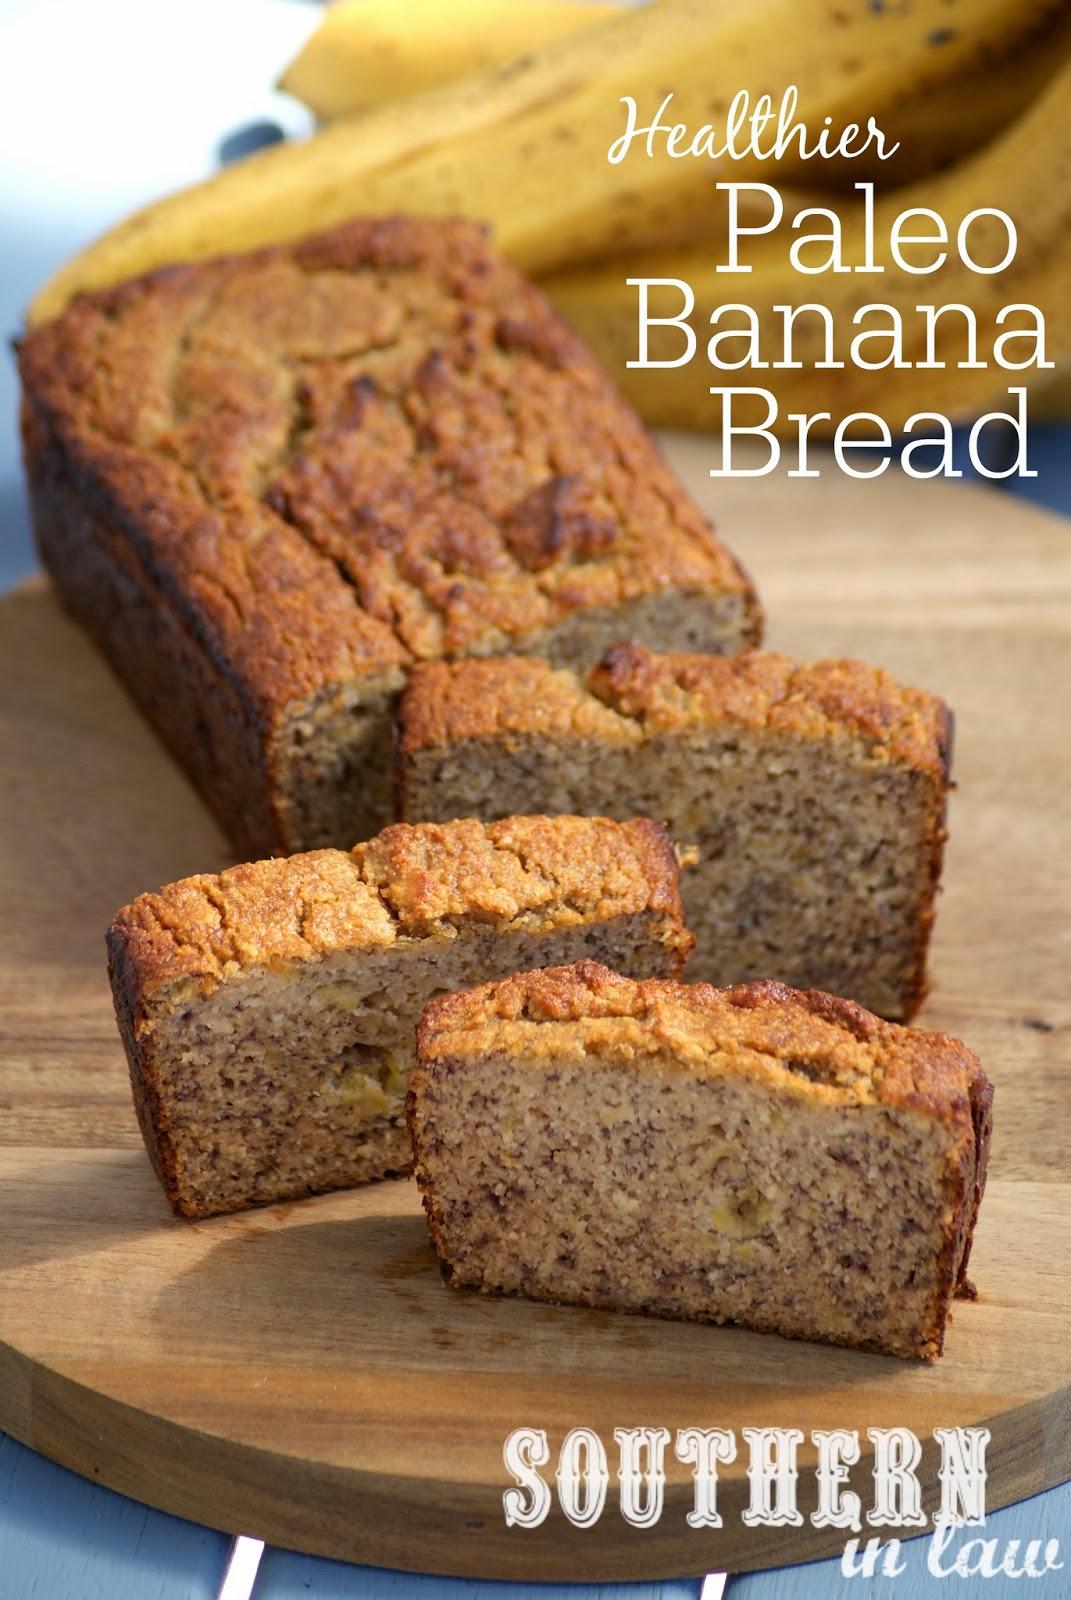 Low fat banana bread bbc good food inducedfo linkedlow fat banana bread bbc good foodhealthy banana bread recipe bbc good food forumfinder Gallery